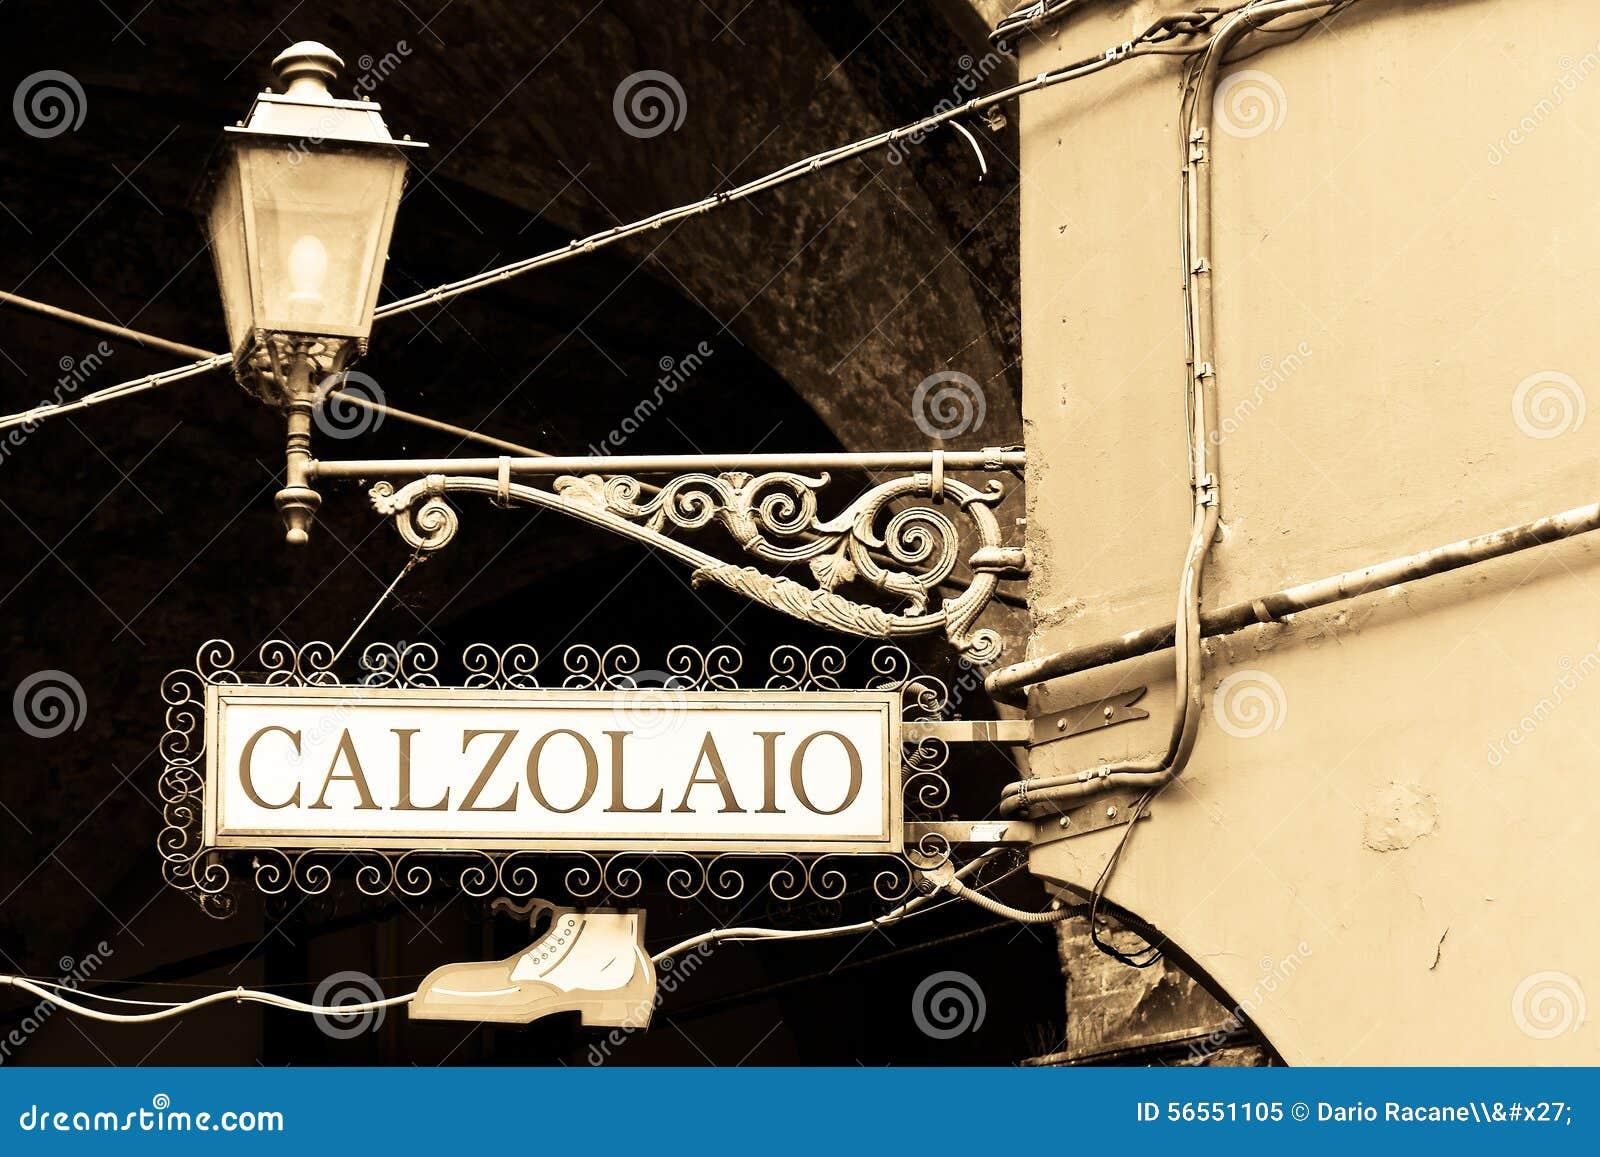 Download Υποδηματοποιός σημαδιών στα ιταλικά Στοκ Εικόνα - εικόνα από βιοτέχνης, χειροτεχνία: 56551105